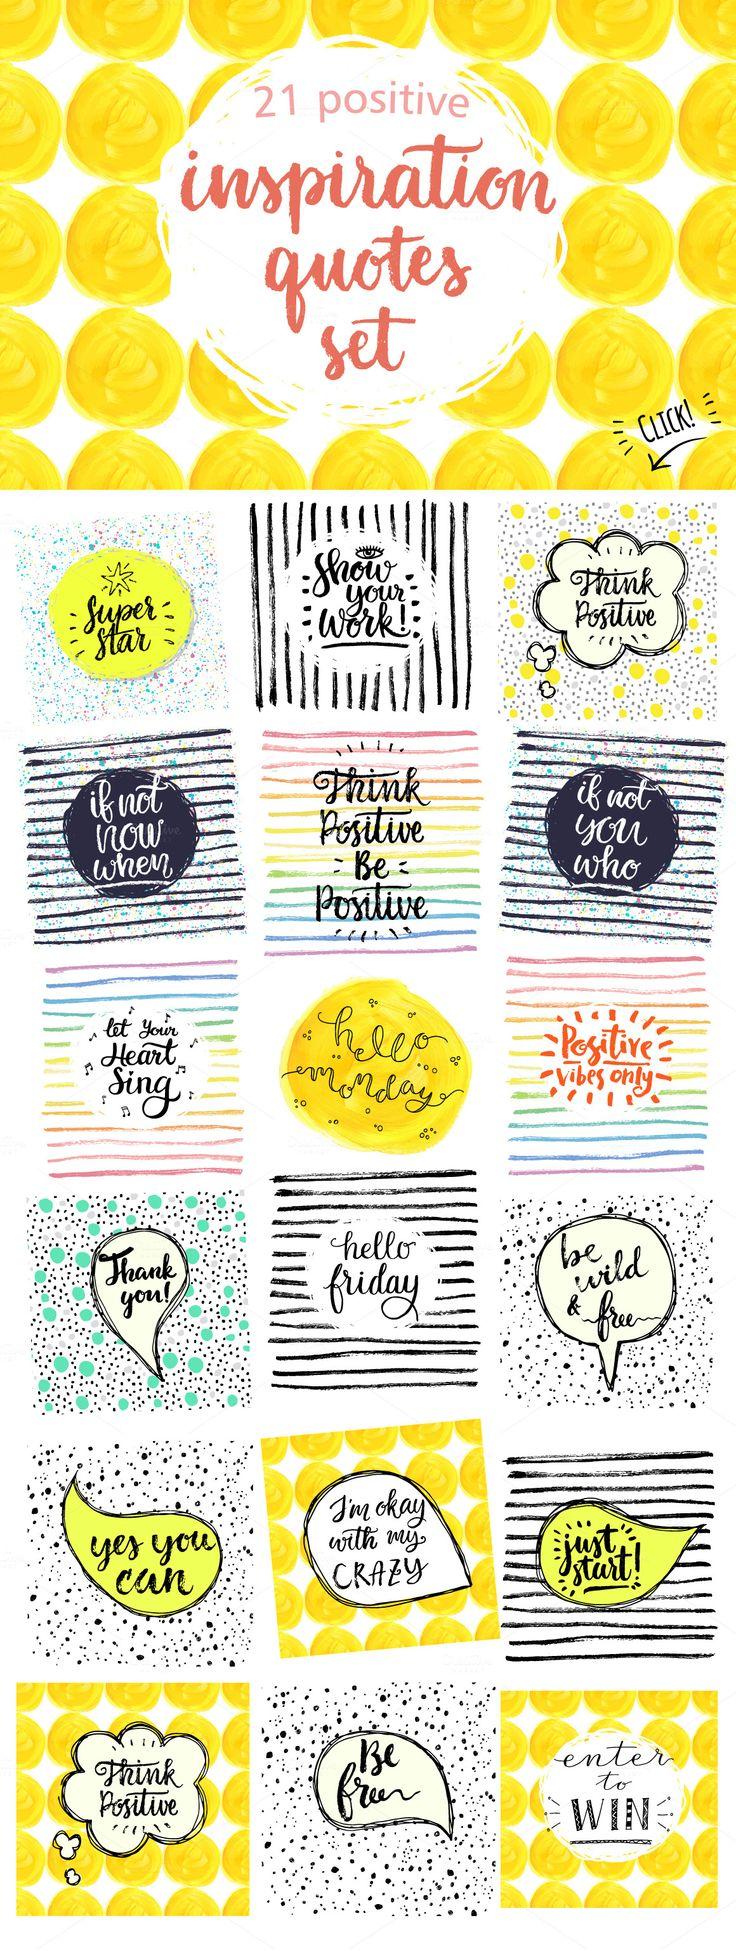 Inspiration quotes set